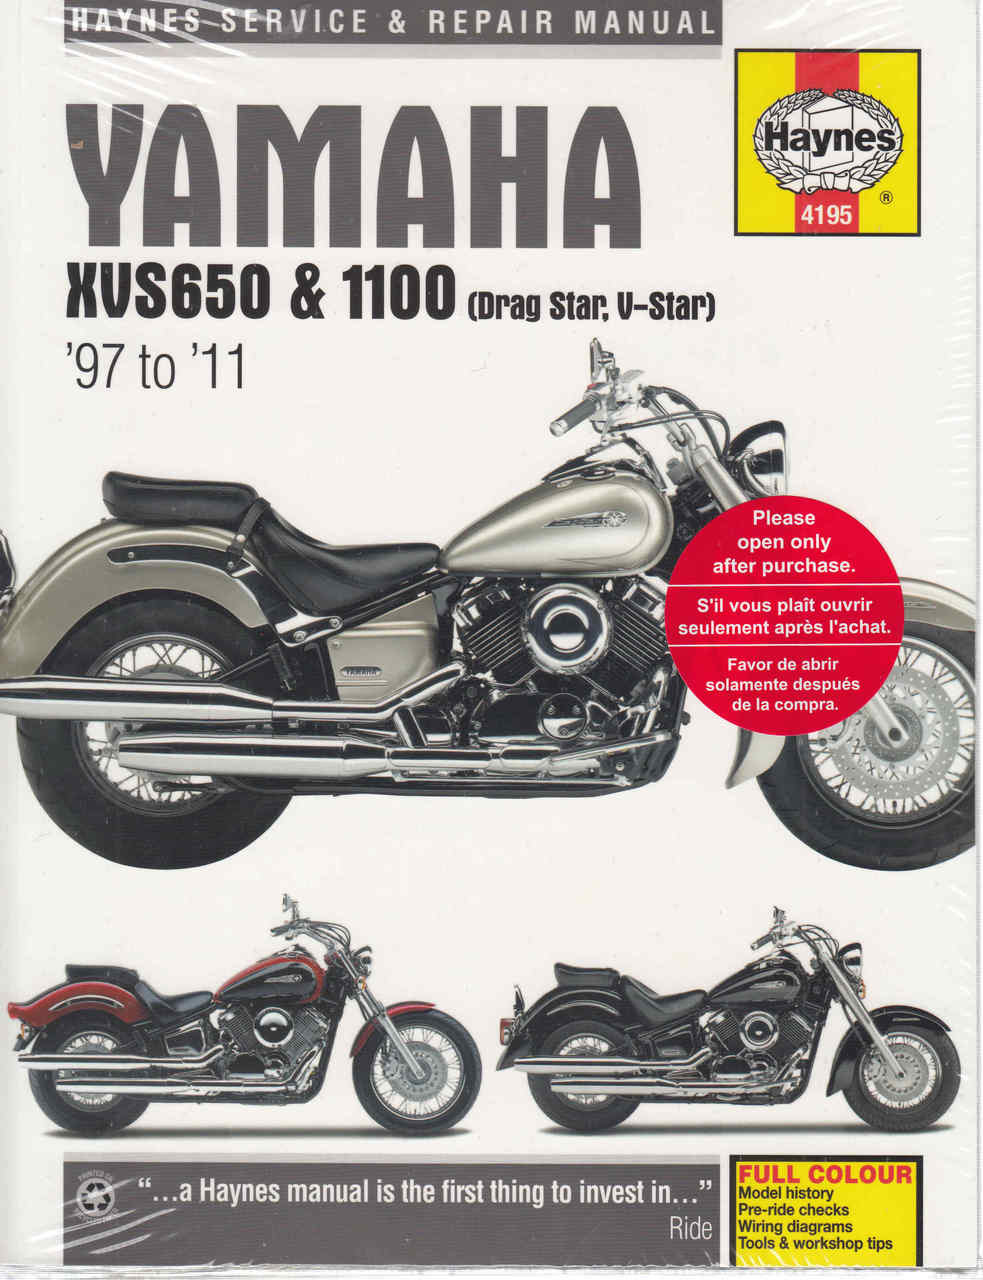 Yamaha Xvs650 Amp Xvs1100 Drag Star V 1997 2005 Workshop 1300 Wiring Diagram And 2011 Manual